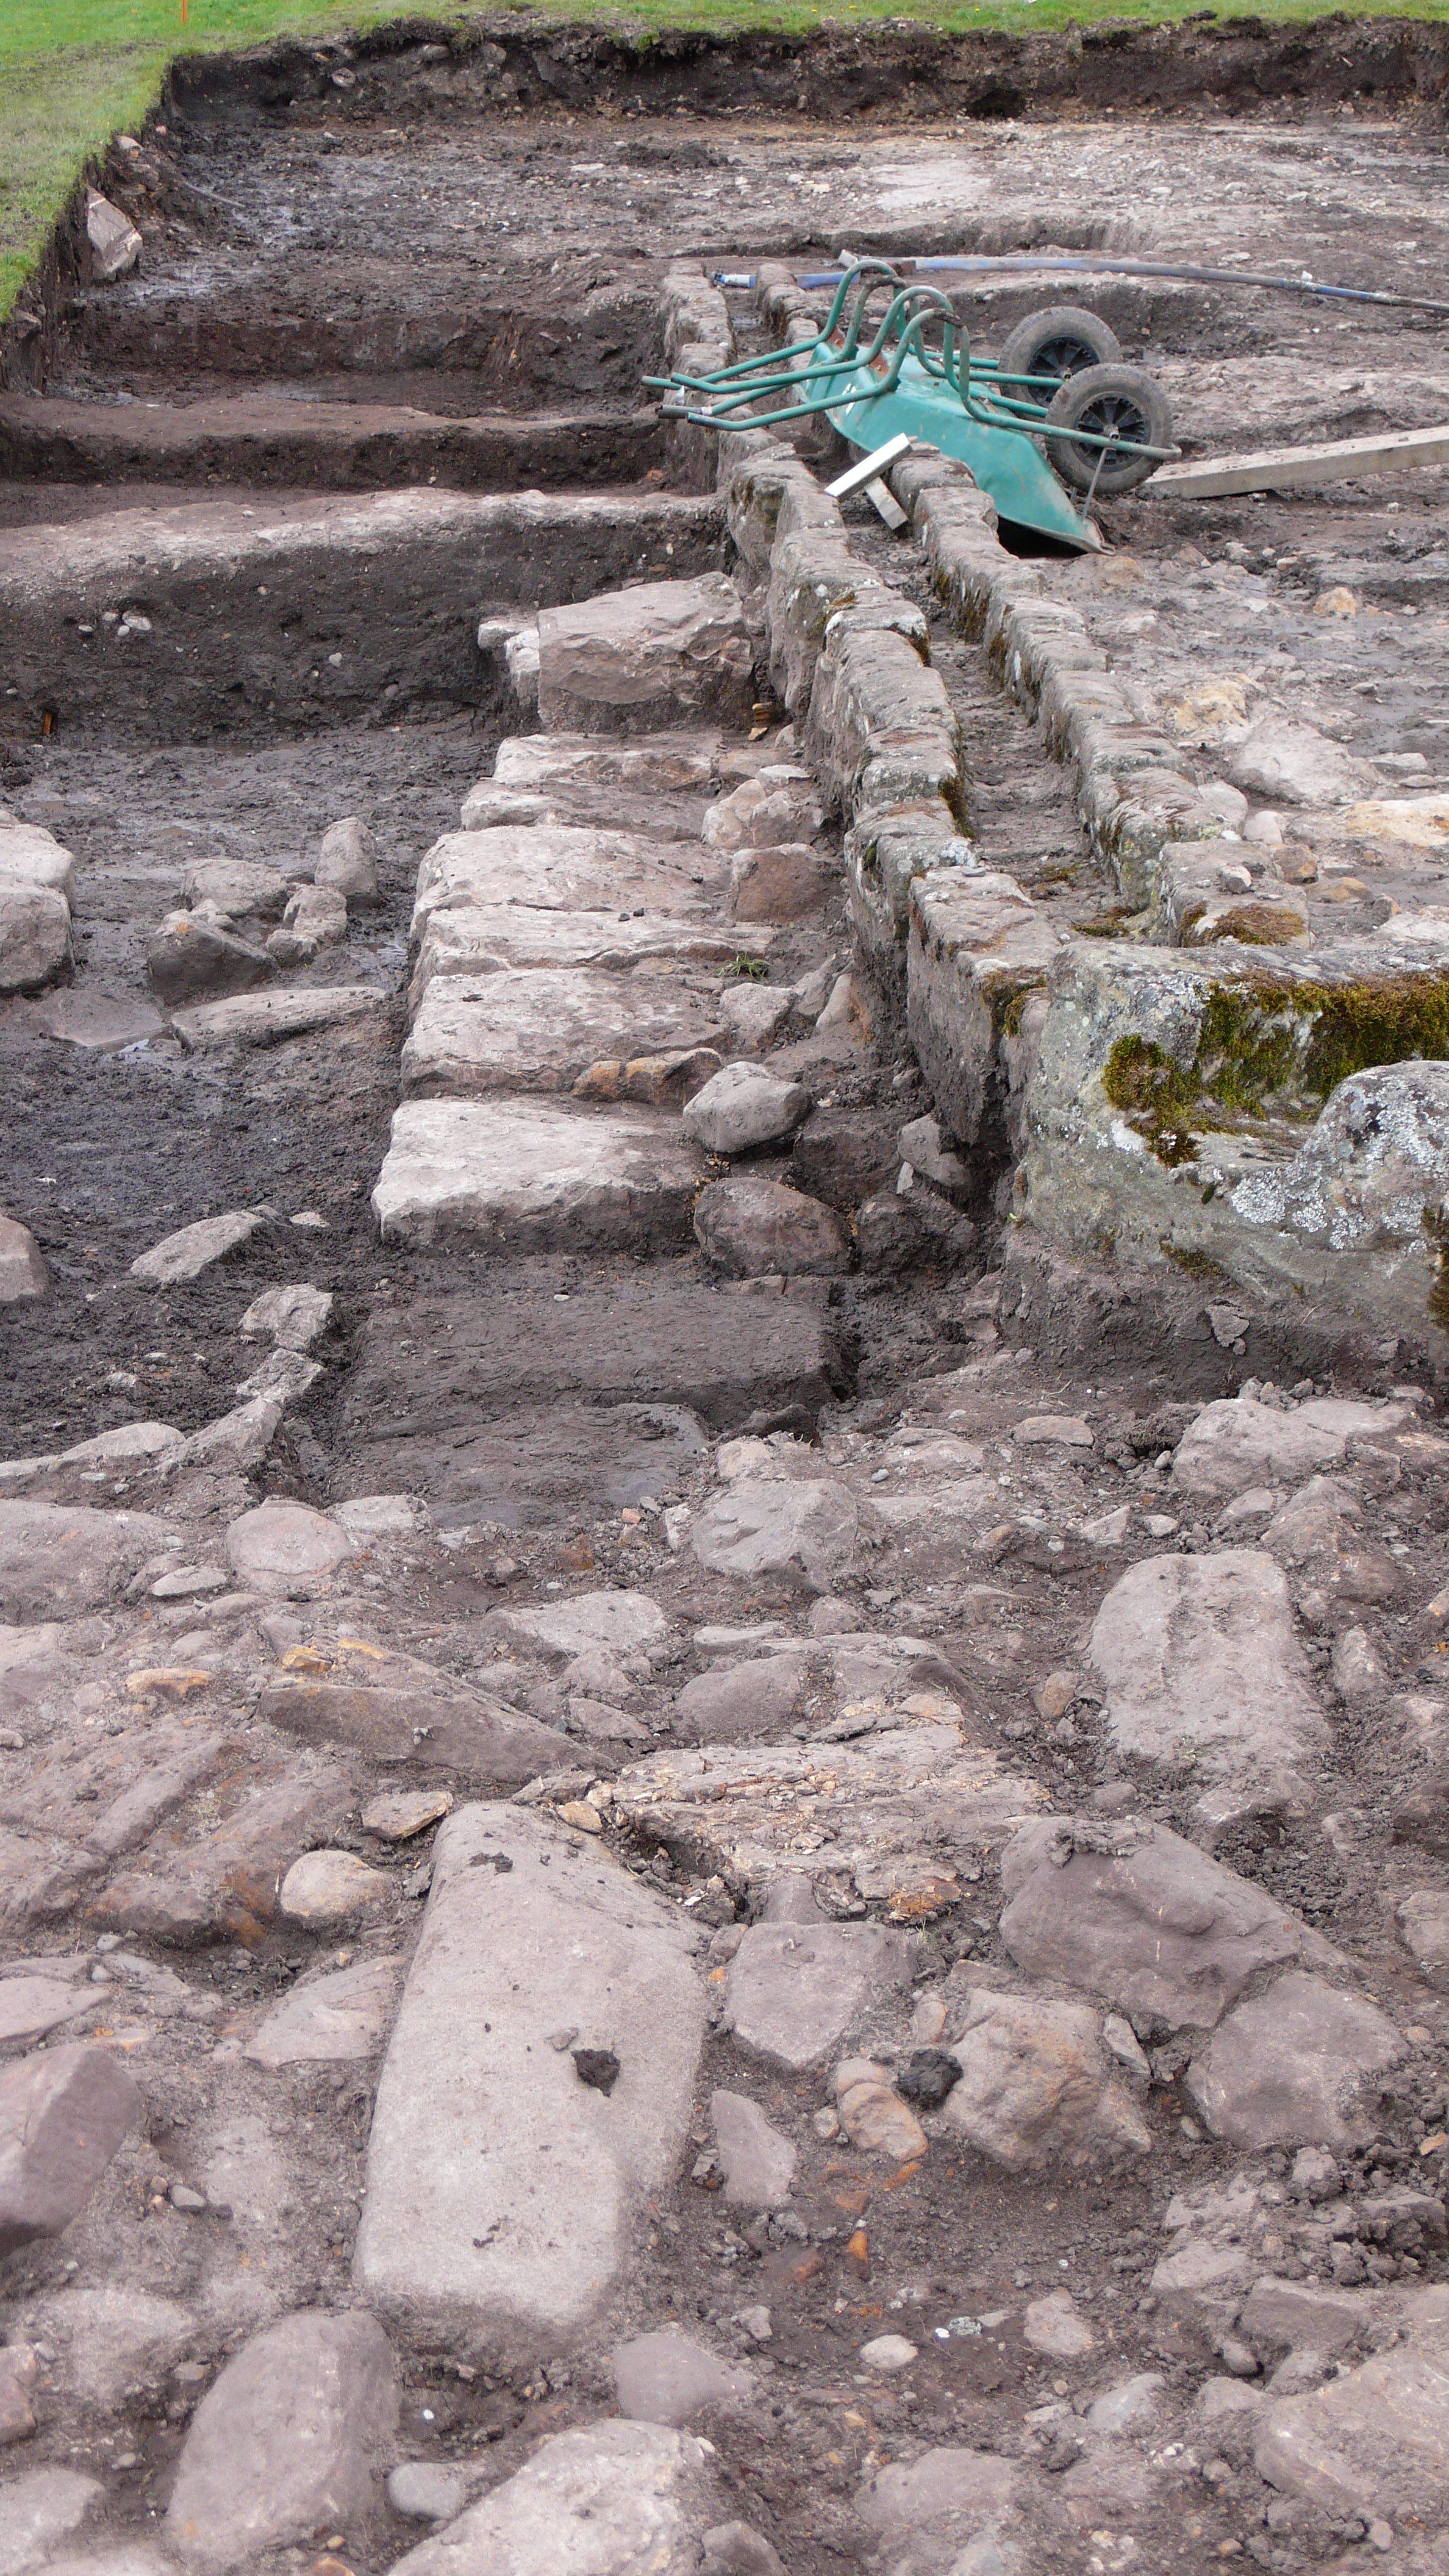 Vindolanda_dig_2012_019.jpg